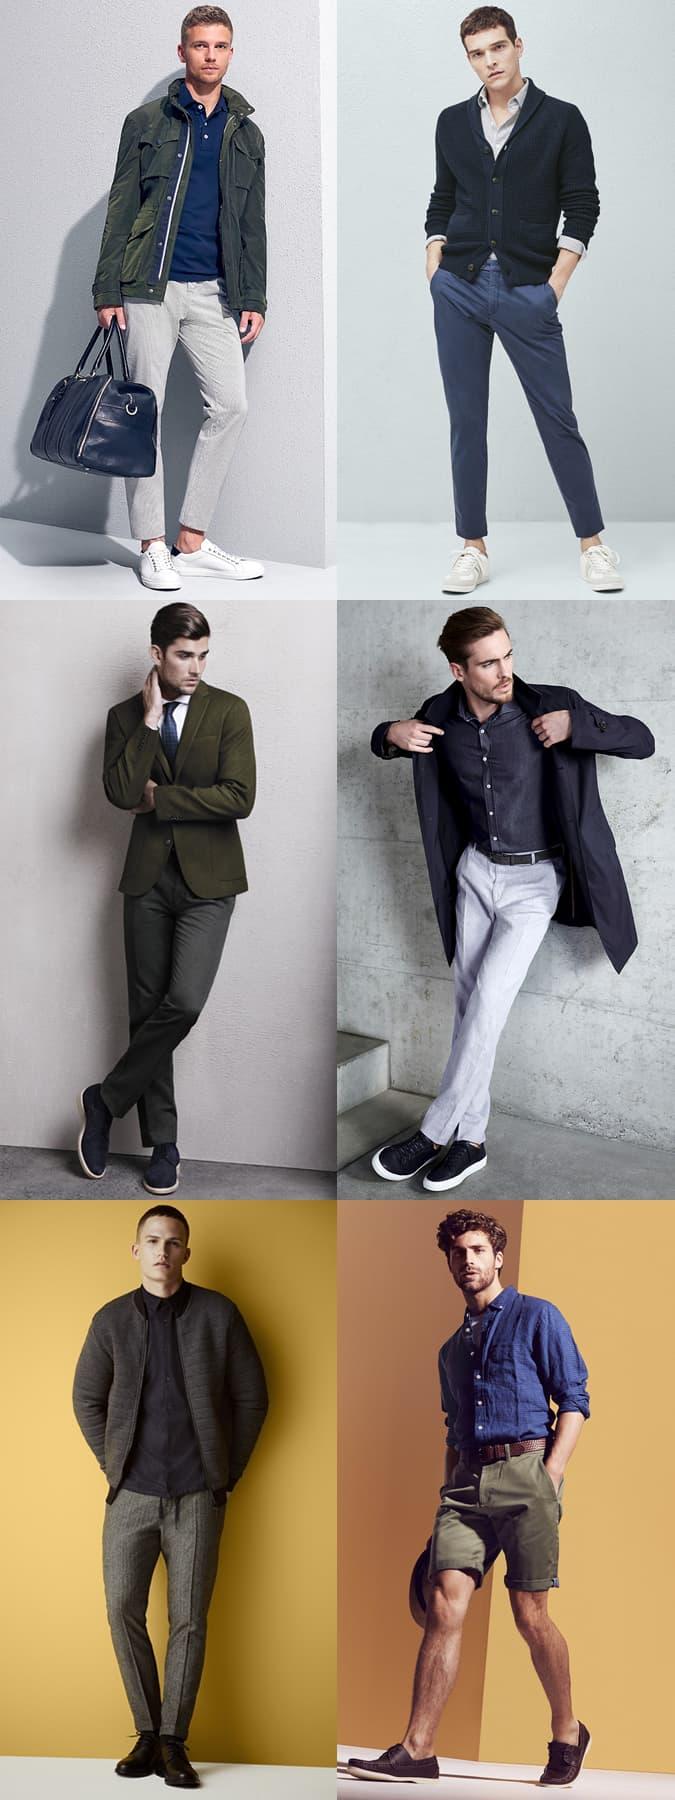 Men's Monochrome Outfit Inspiration Lookbook